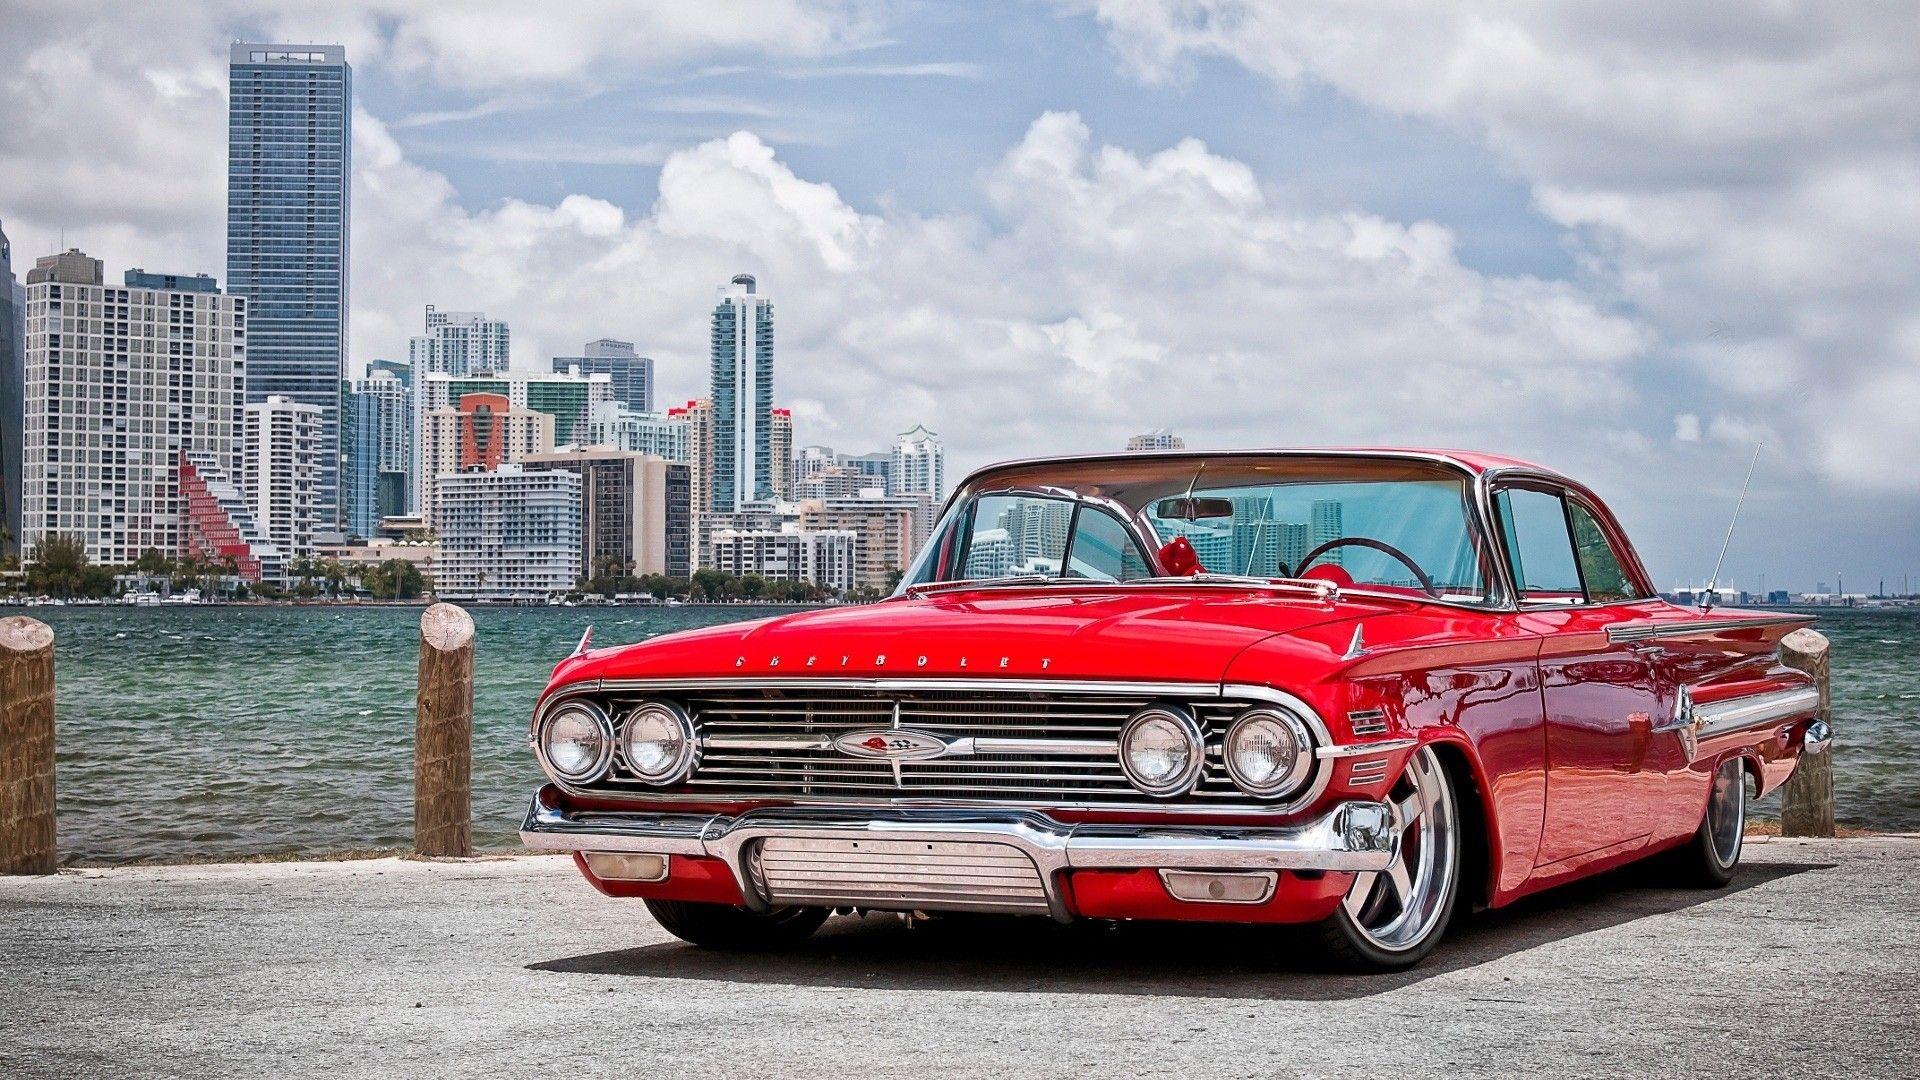 Cars and more chevy impala chevy impalas vehicles drag racing racing - Our 1960 Chevy Impala Ride 1960 Impala Big Block Matching Edelbrock Rpms Heads Edelbrock Intake Edelbrock